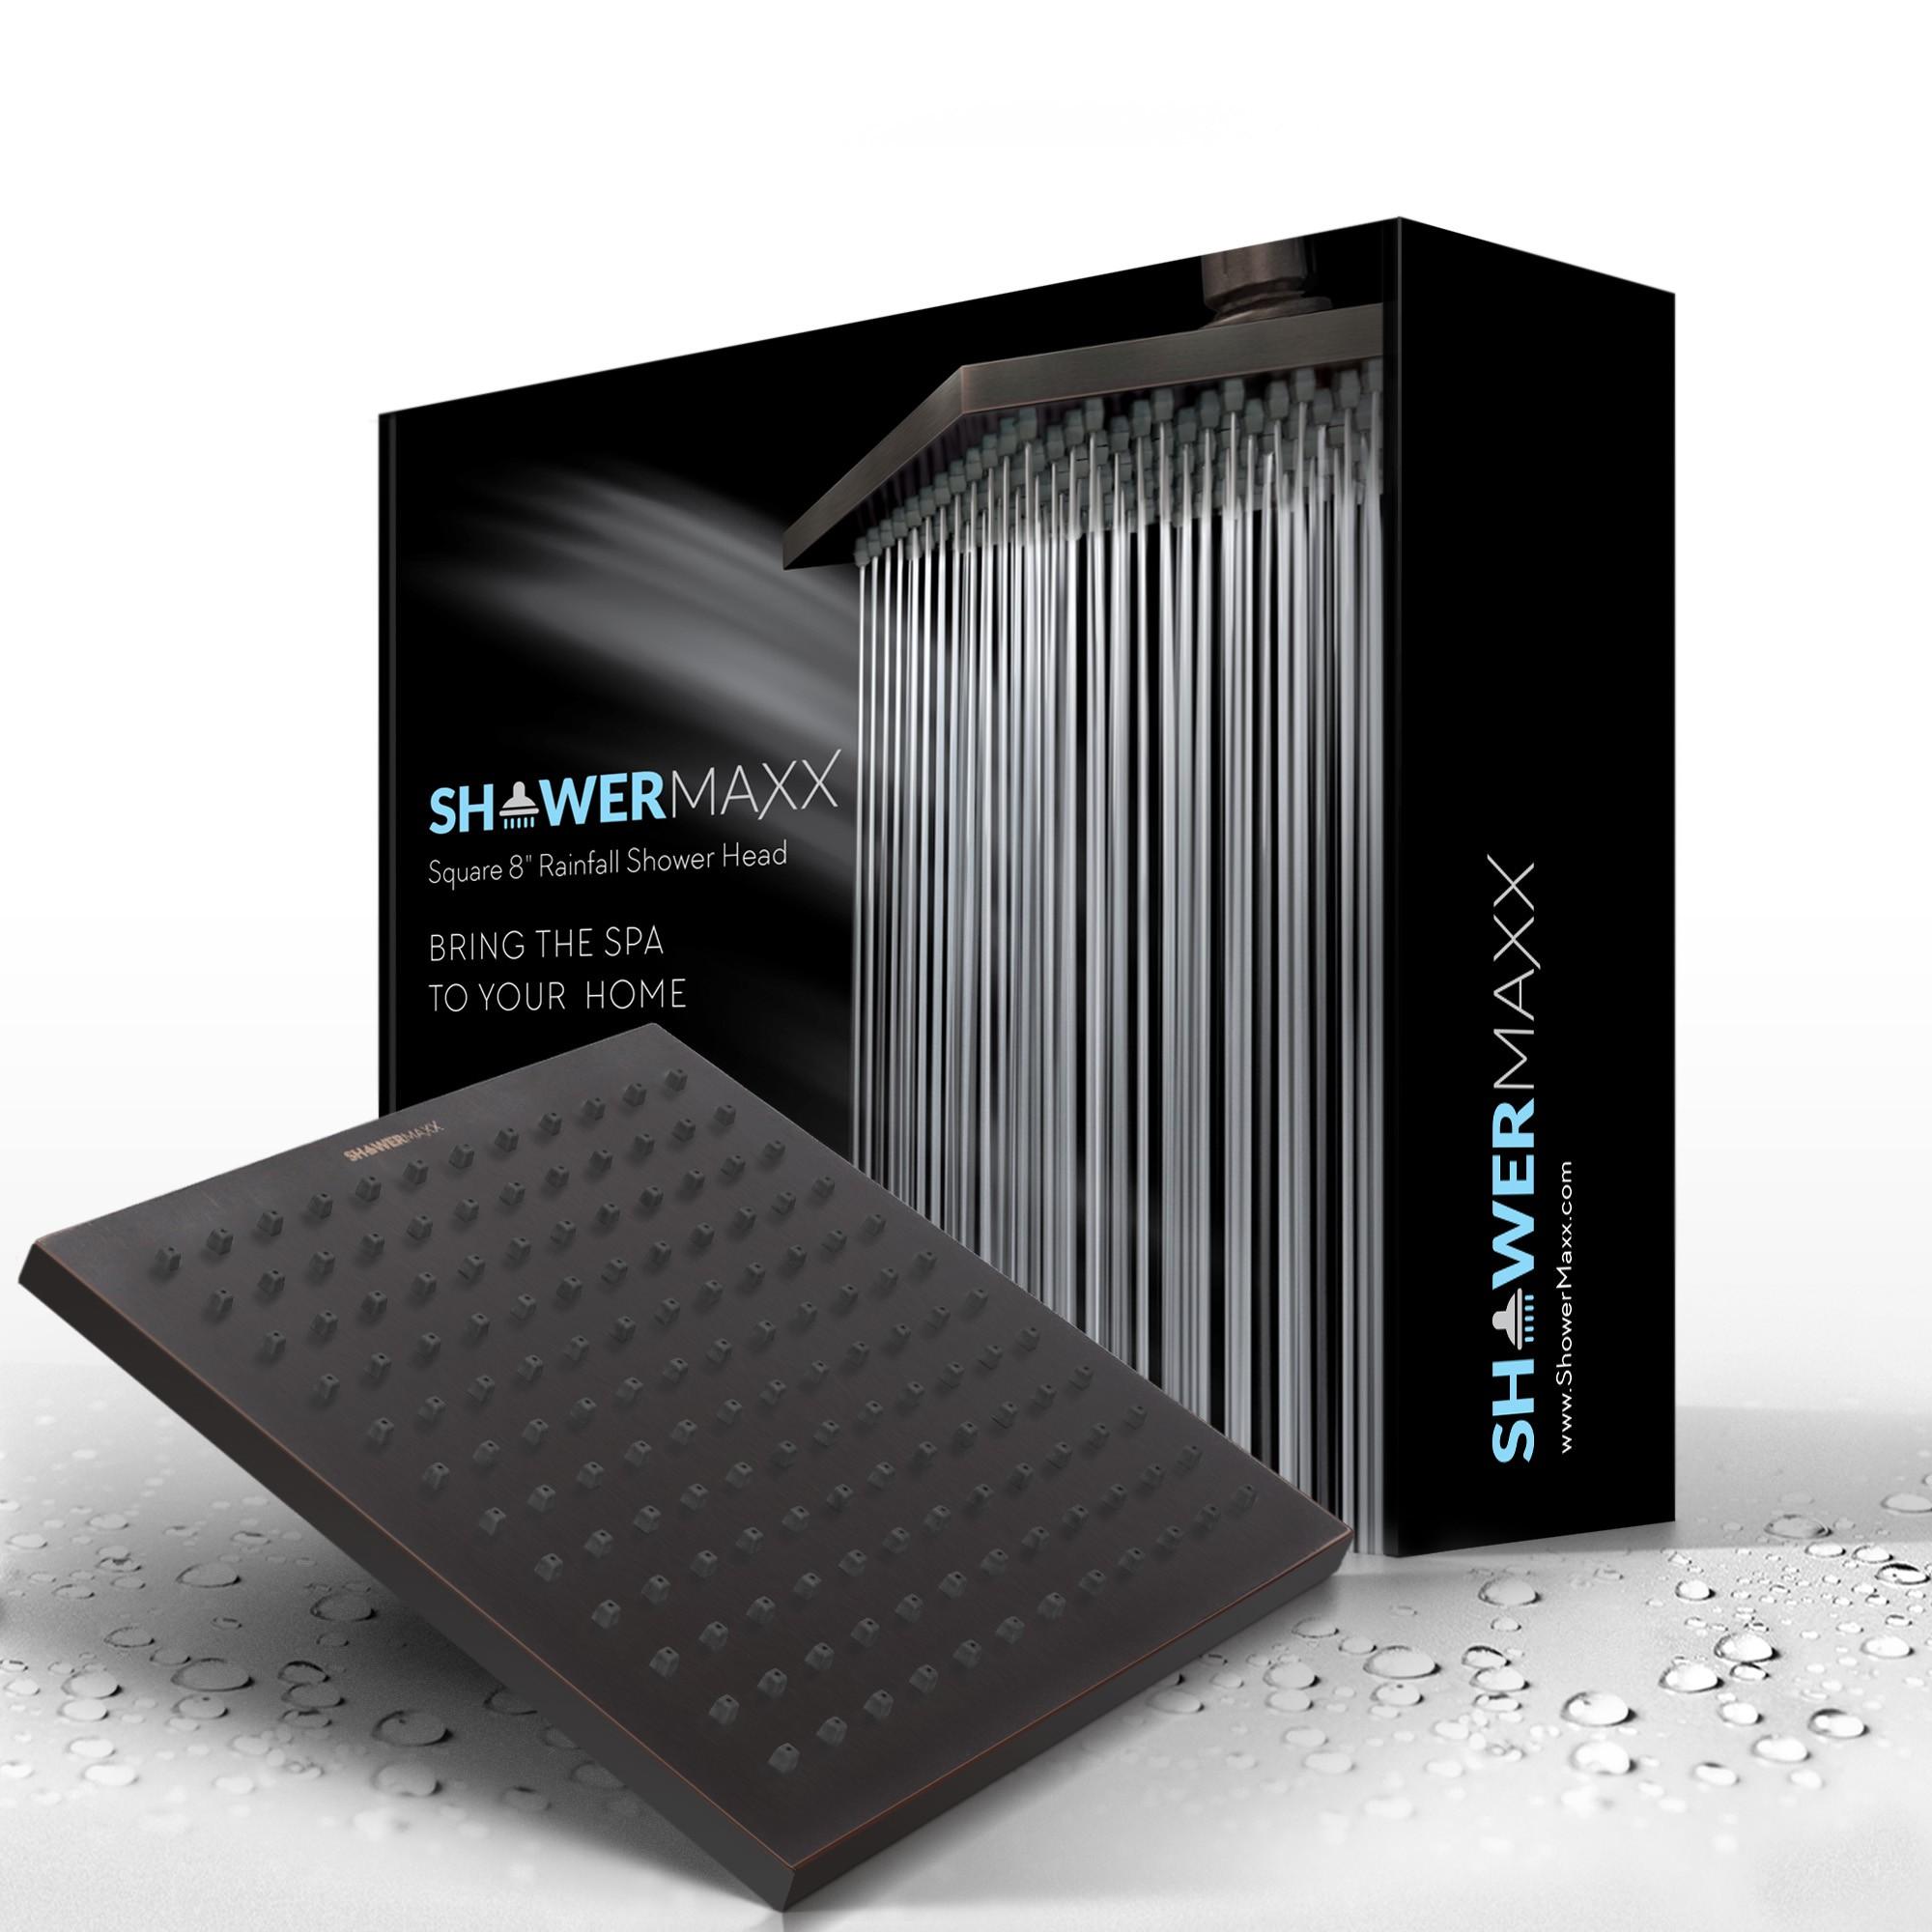 Square Rainfall Shower Head - Packaging